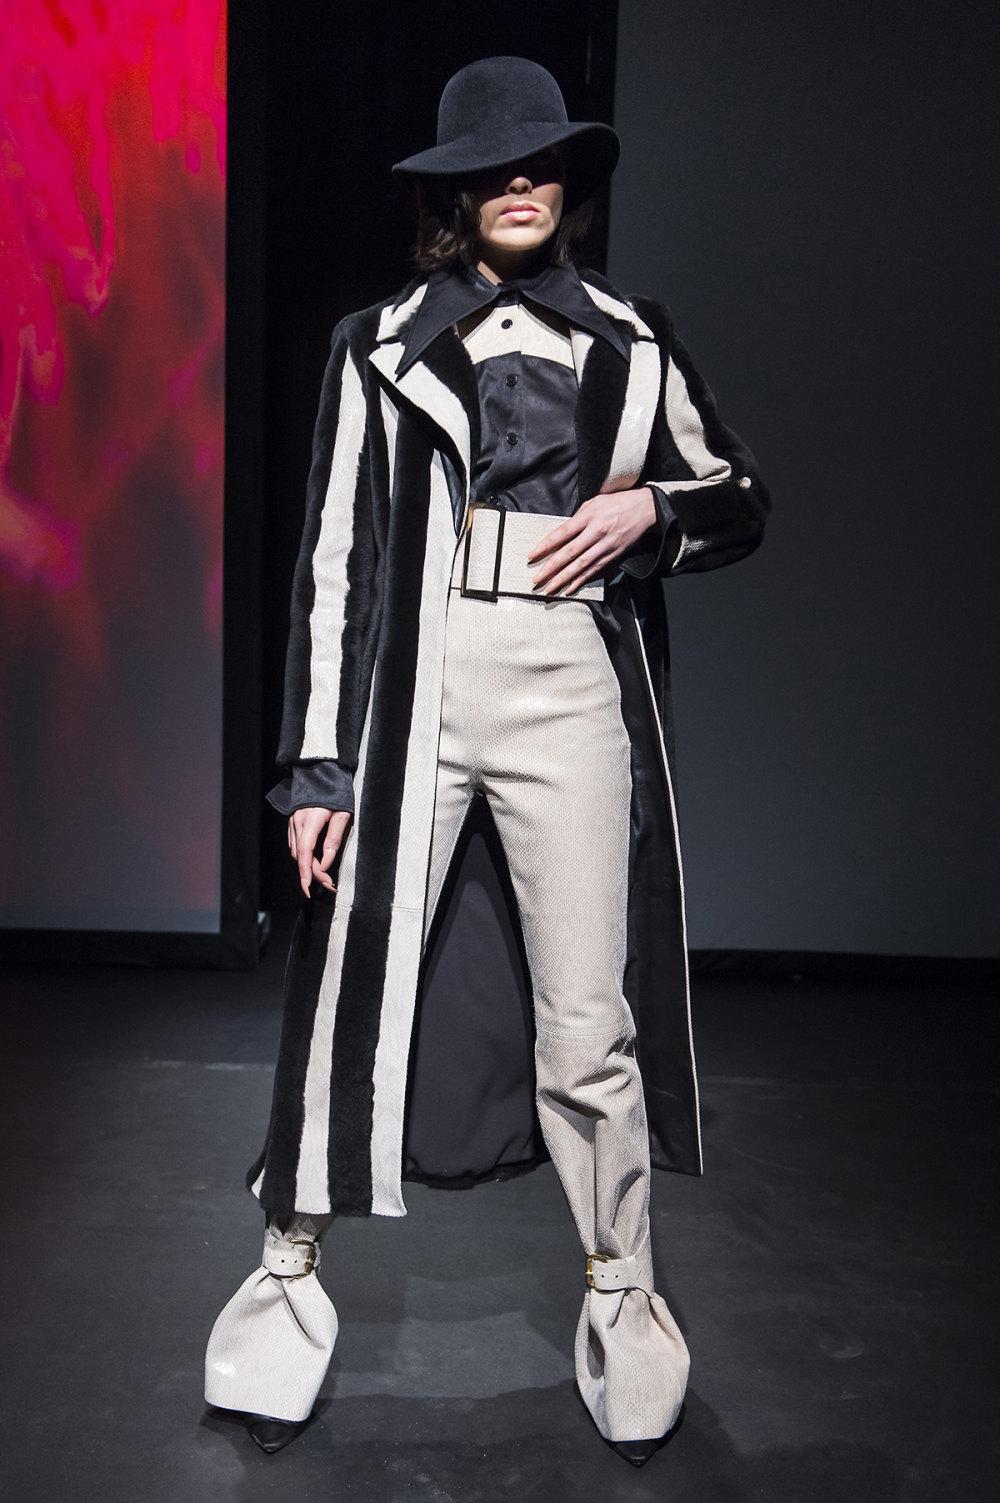 16Arlington时装系列标志性的時尚单色西装外还有更大胆的版本-4.jpg